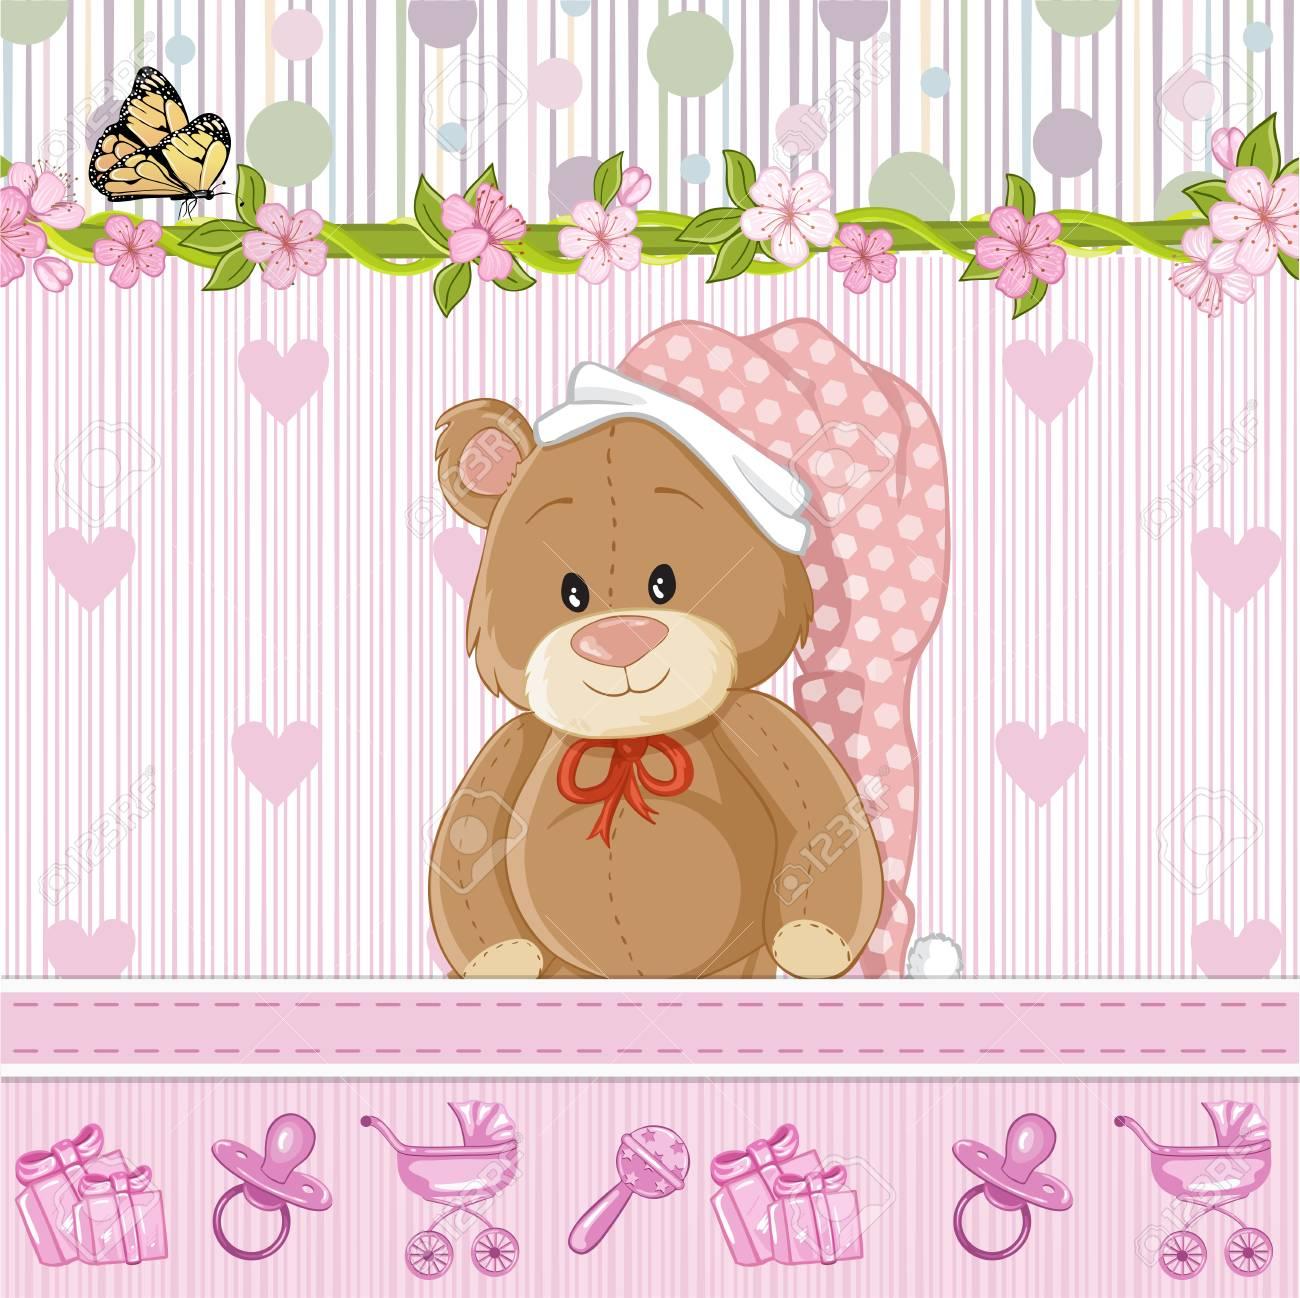 Teddy Bear For Baby Girl Baby Shower Invitation Royalty Free